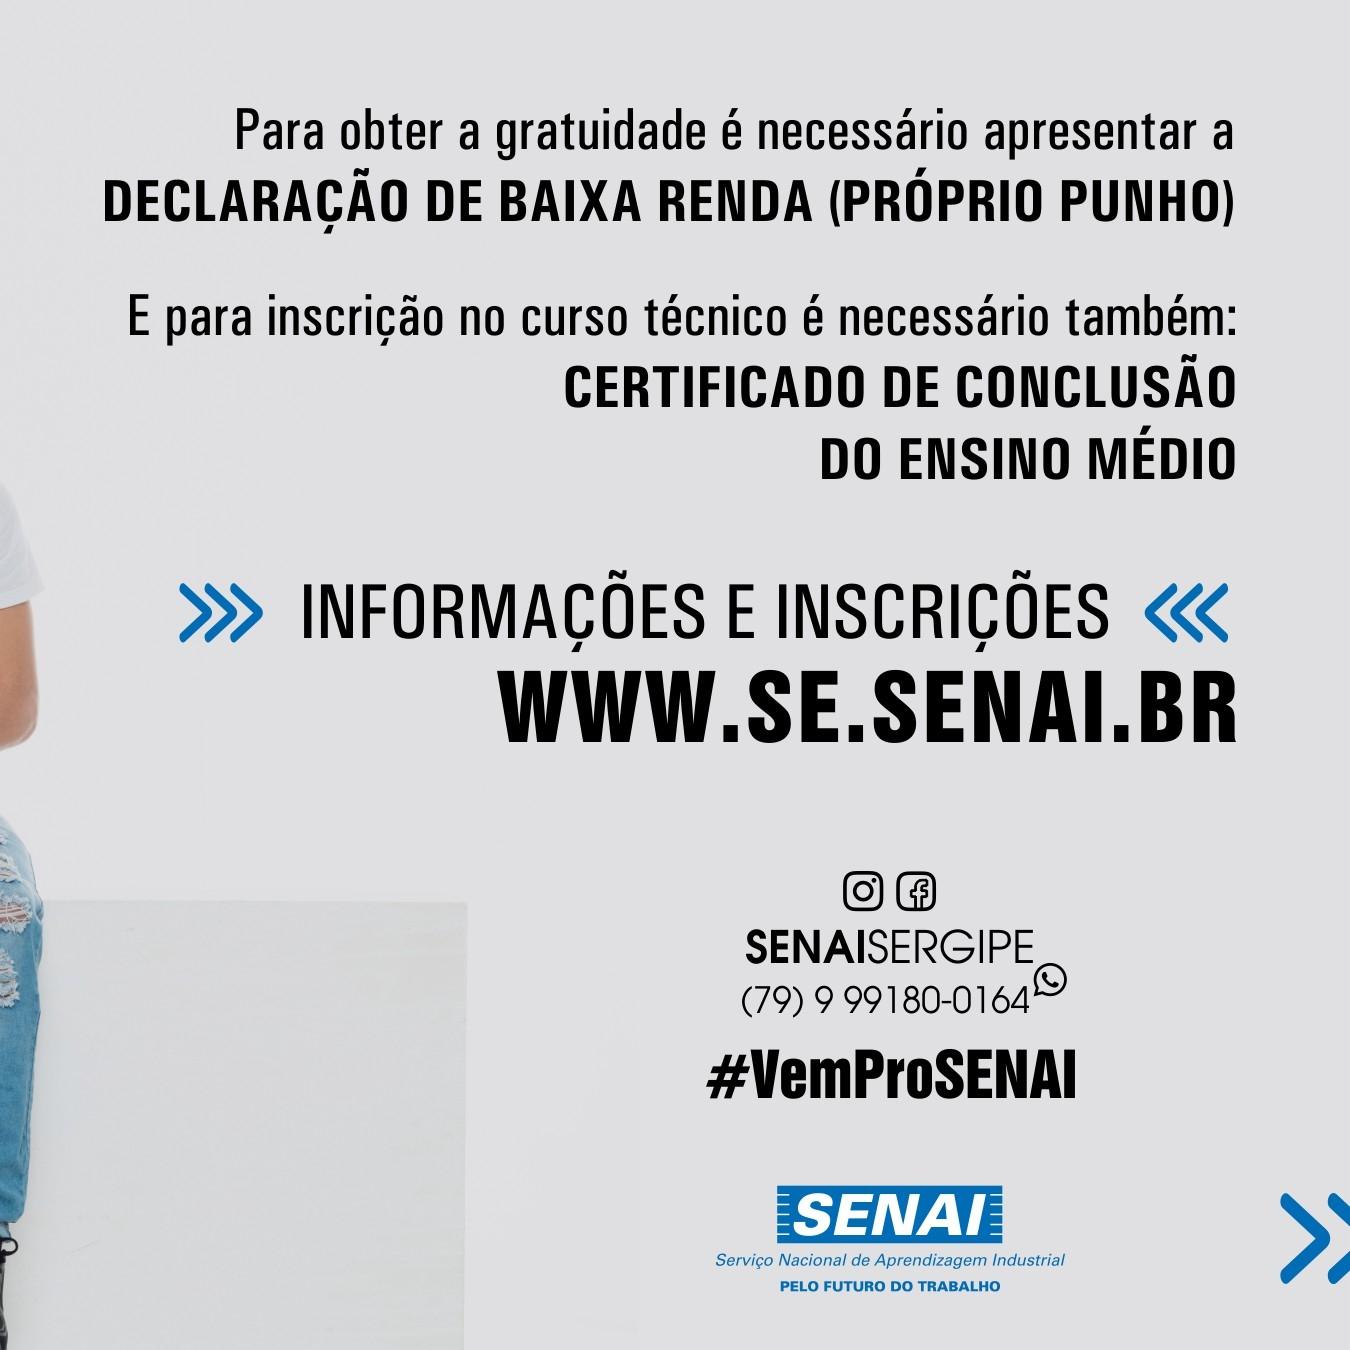 TELA02 - SENAI_PROGRAMACAO_GRATUITO_VER2.jpg